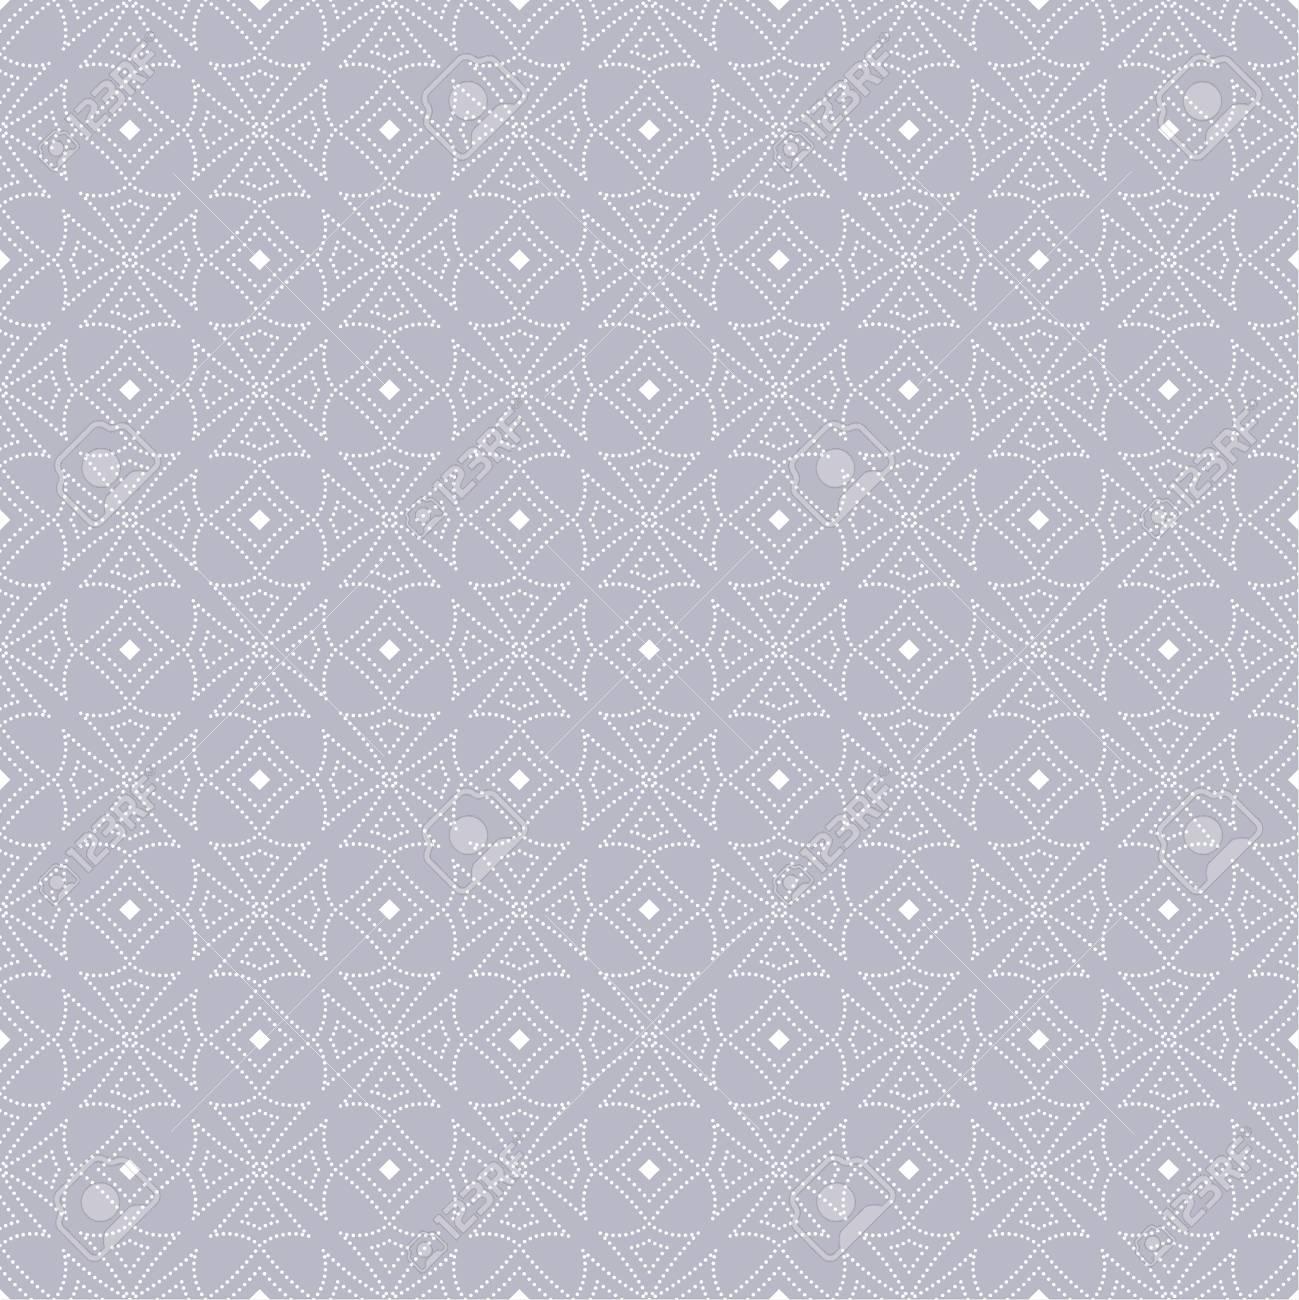 Patrón Transparente De Vector. Repetición De Textura Punteada De ...